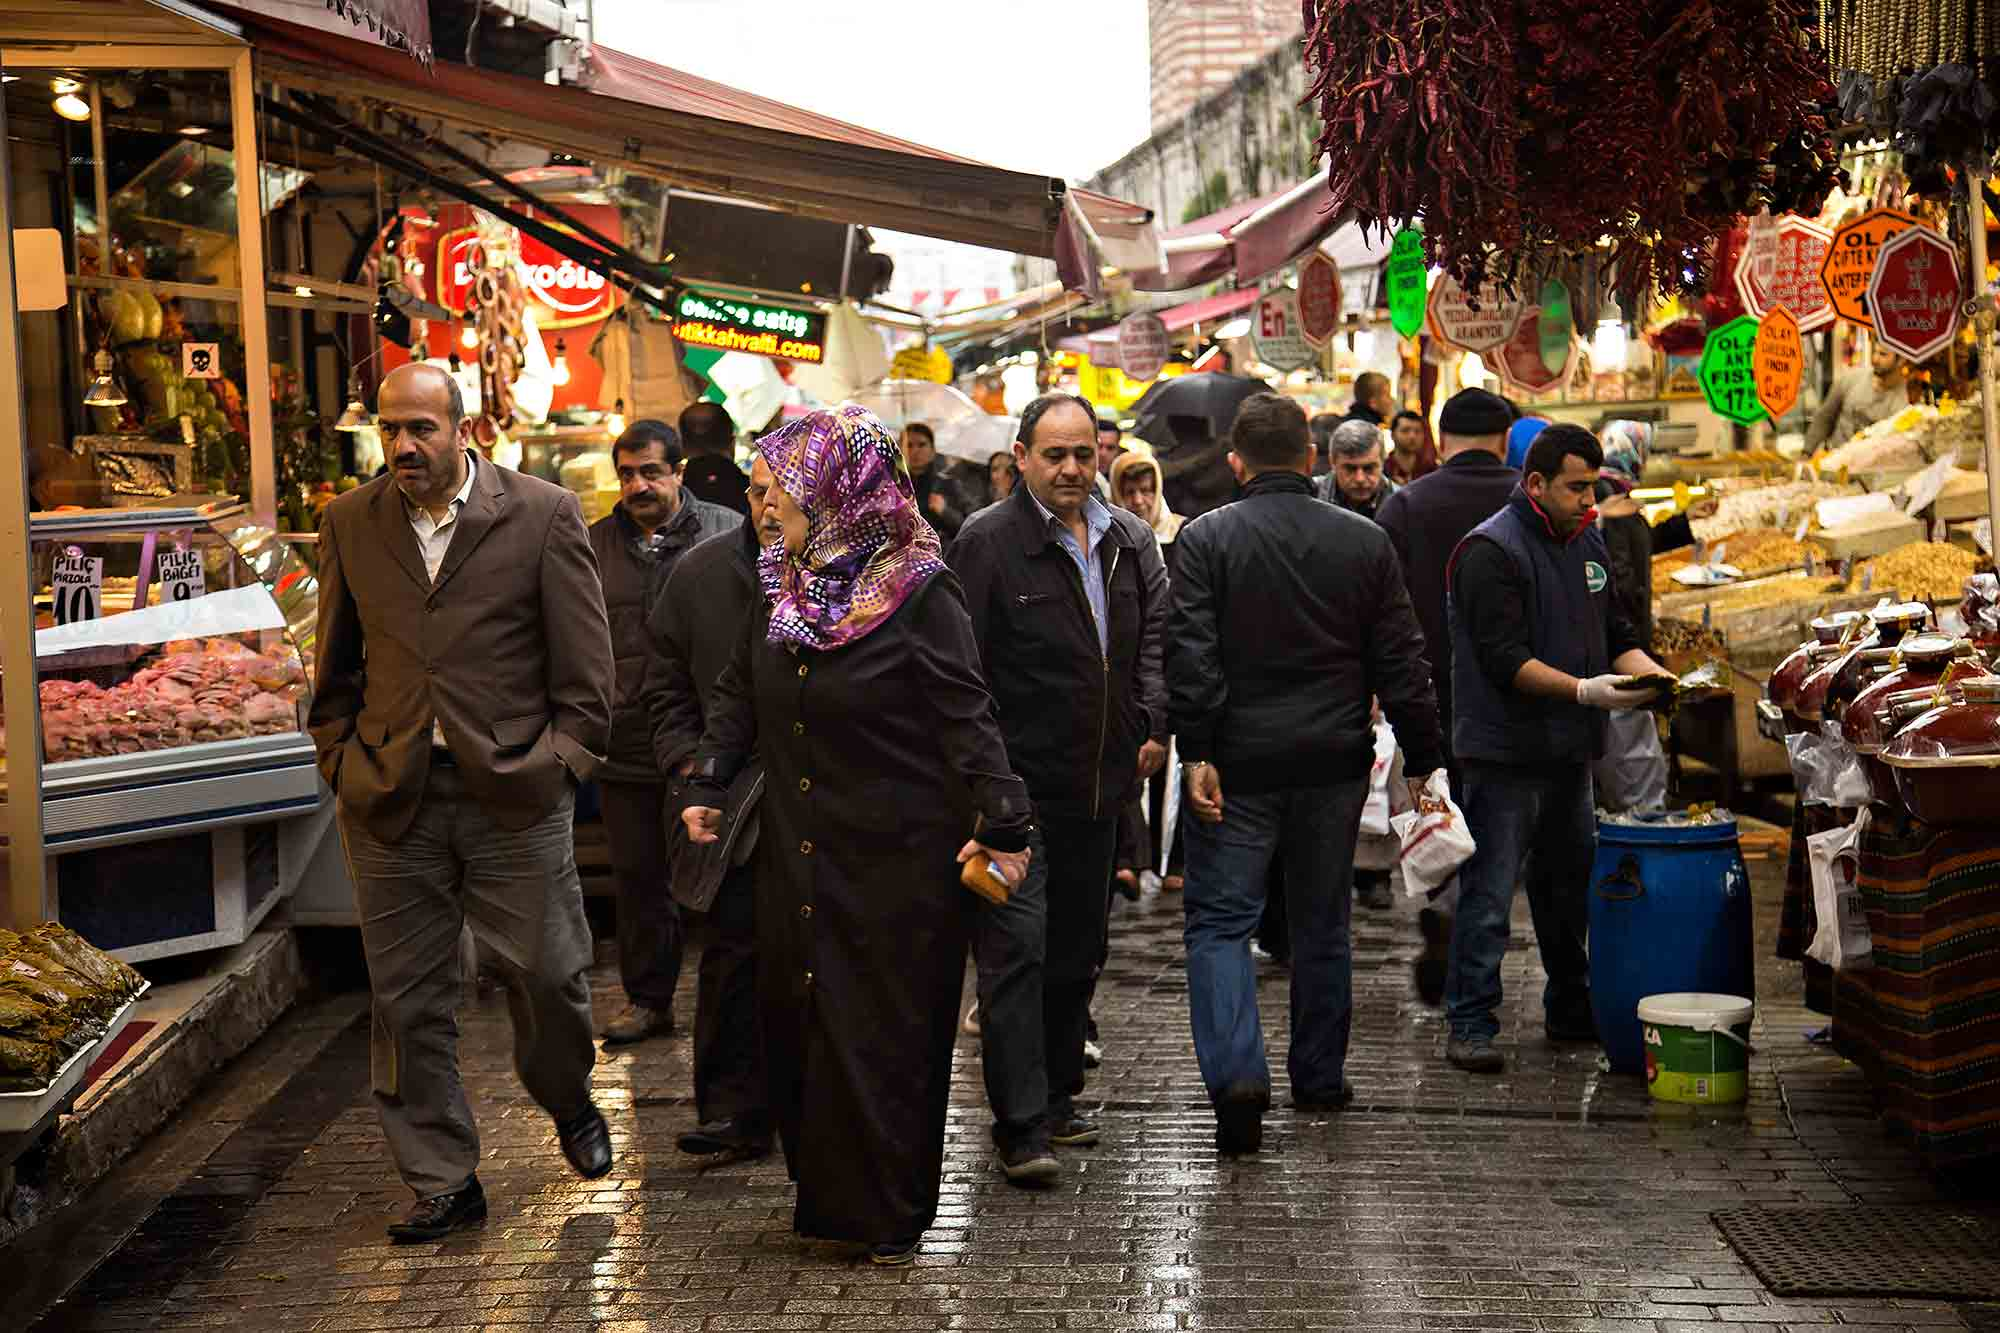 Spice Market in Istanbul, Turkey. © Ulli Maier & Nisa Maier